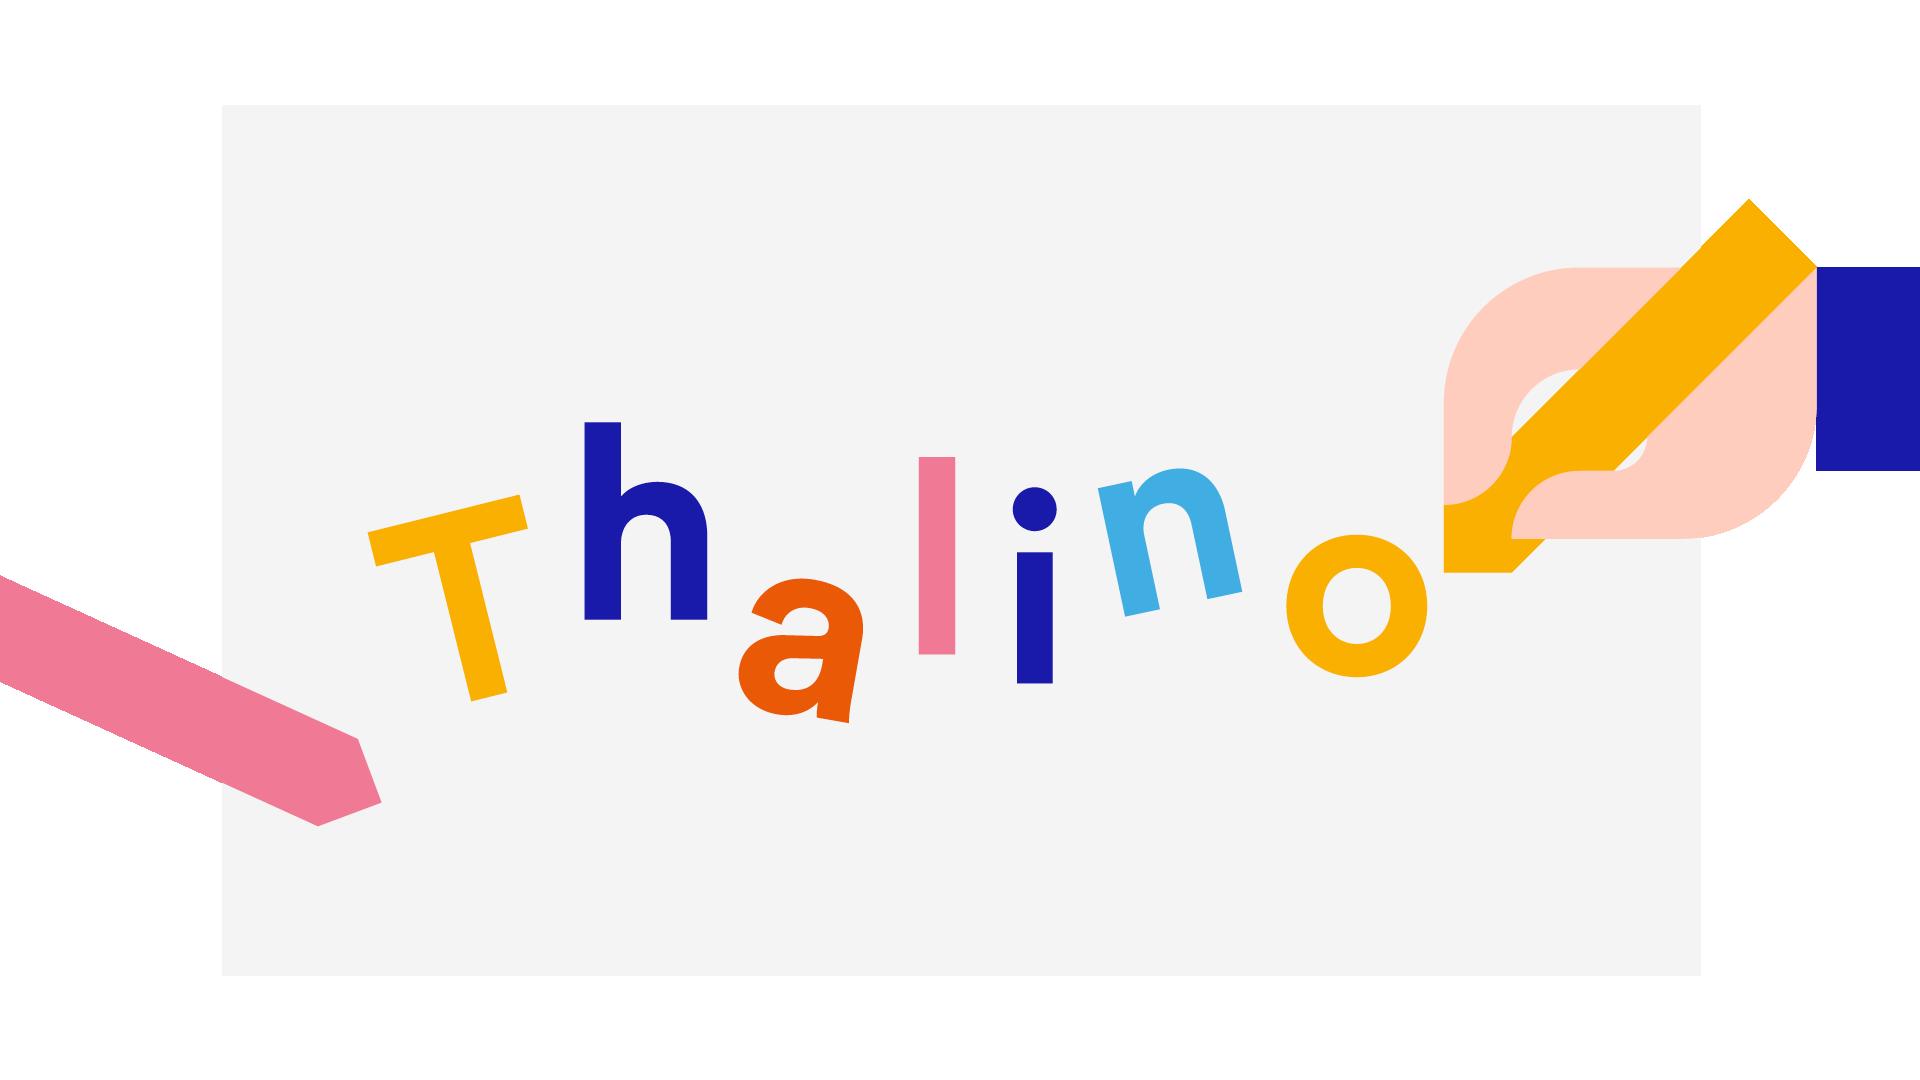 Ref Thalino 2 Logo Servicehand